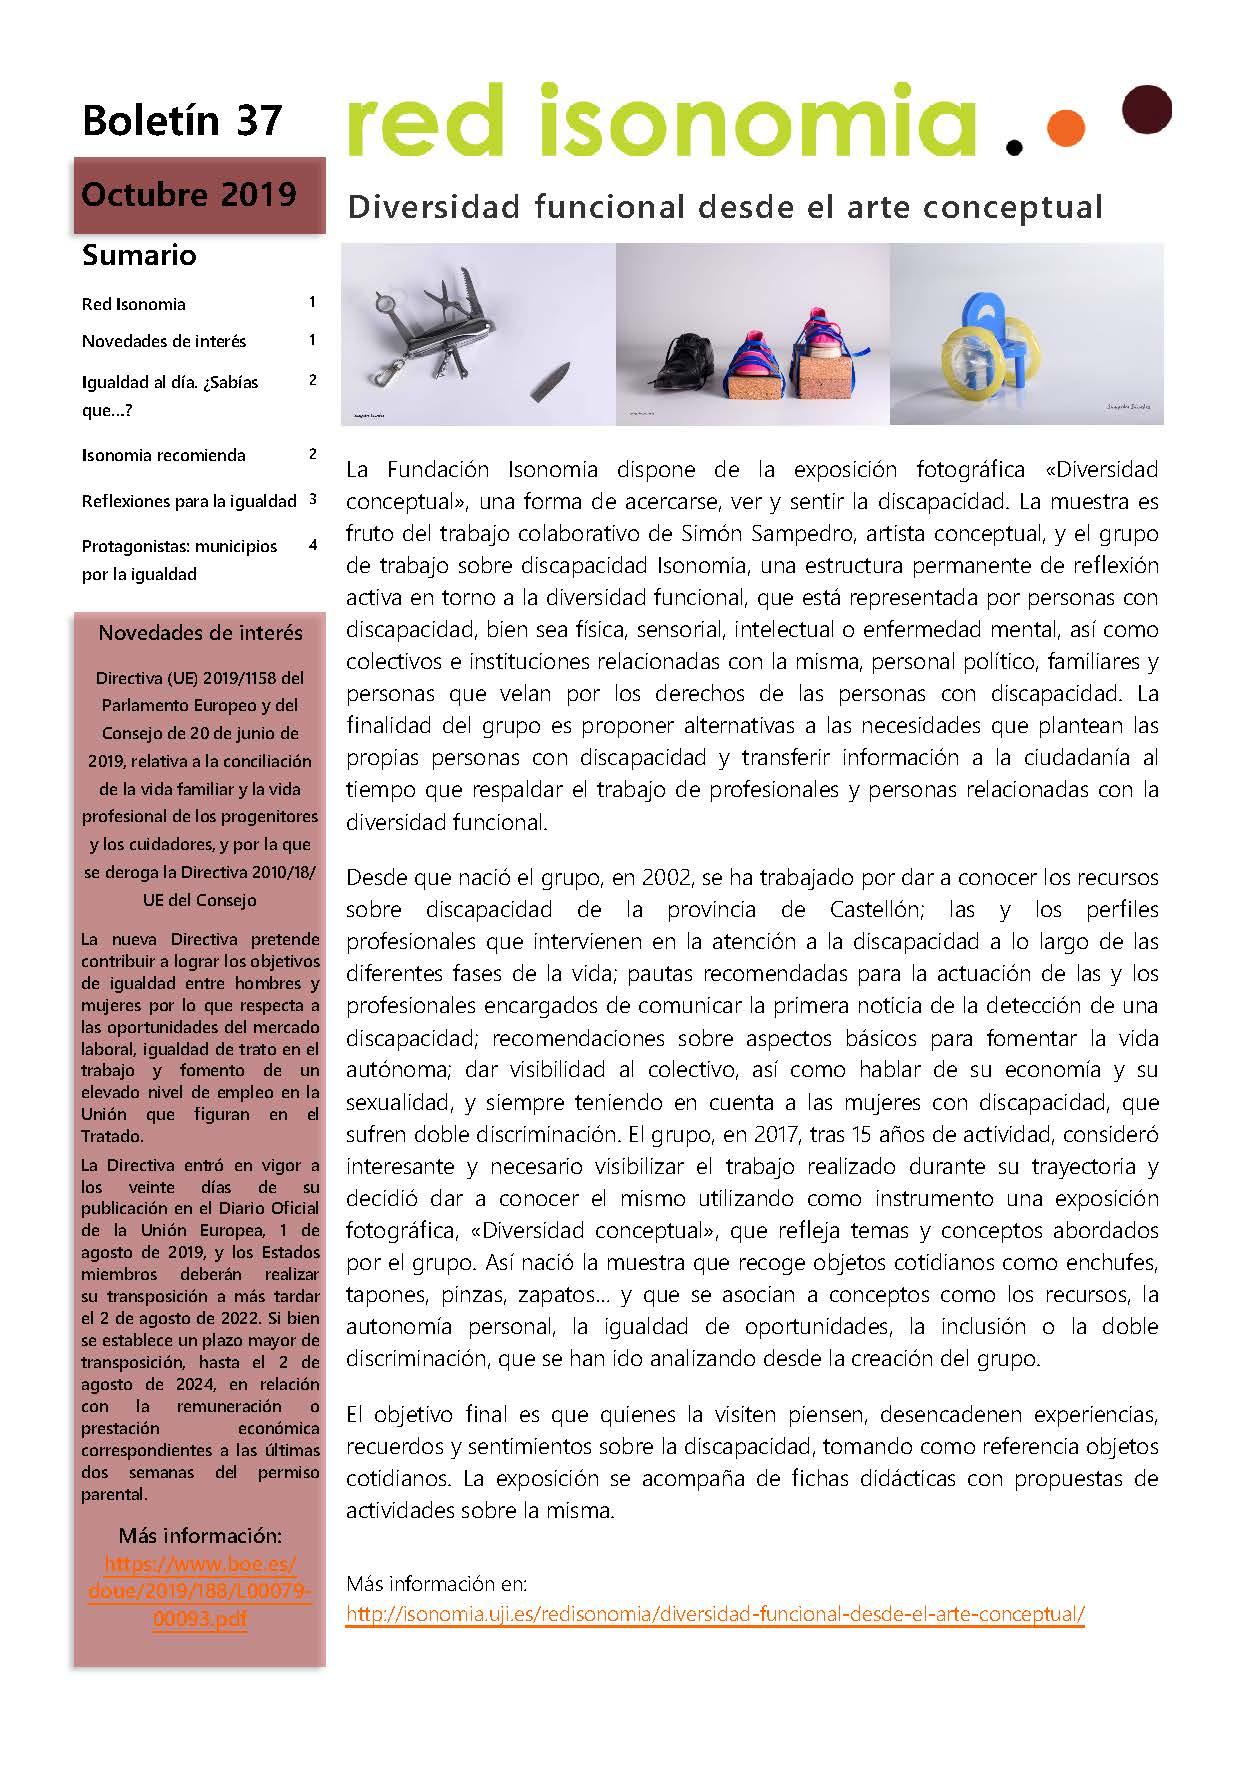 http://isonomia.uji.es/redisonomia/wp-content/uploads/2019/10/DEF-Boletín-37_Página_1.jpg